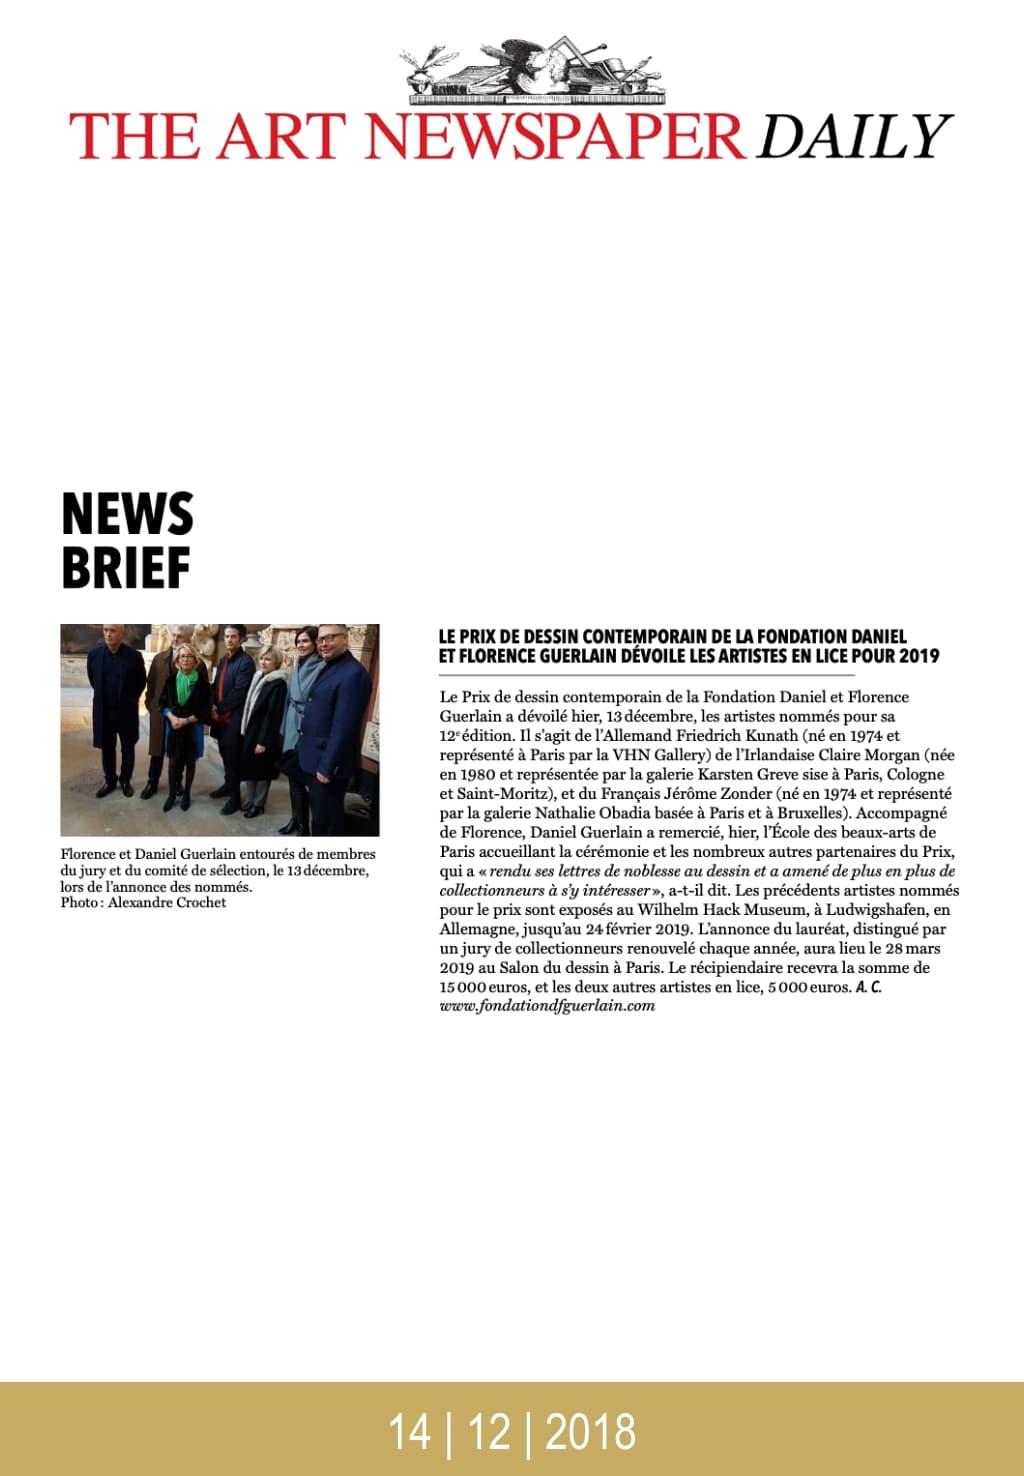 Article de presse du Salon du Dessin 2019 : The Art Newspaper Daily